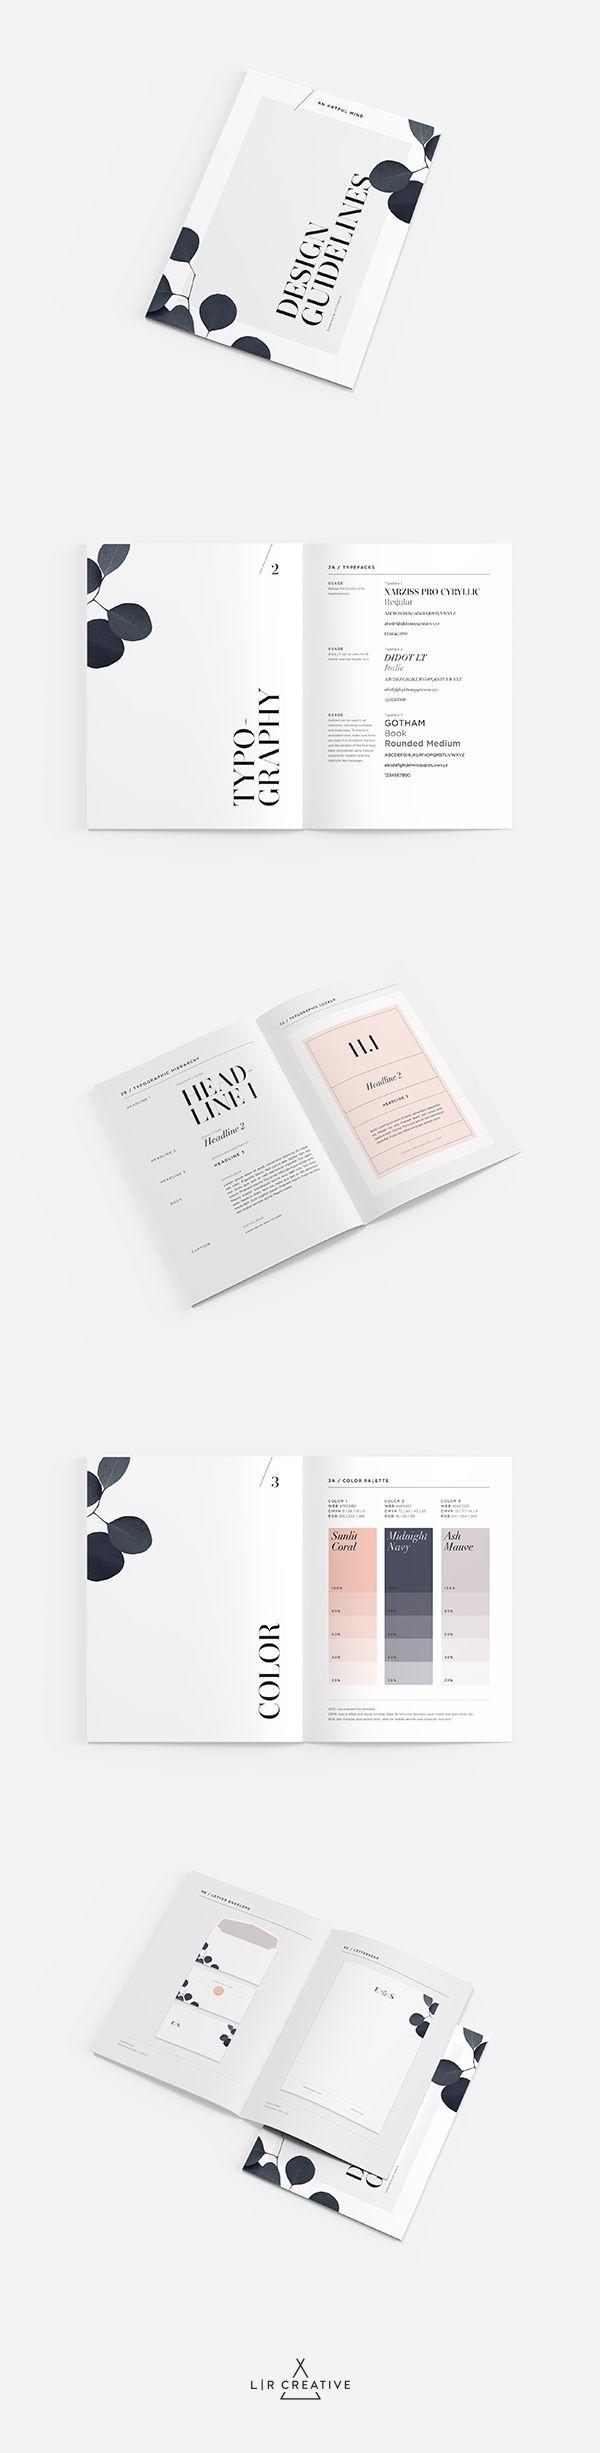 An Artful Mind Design Guidelines by LR Creative #LRCreative #DesignGuide #Branding #Identity